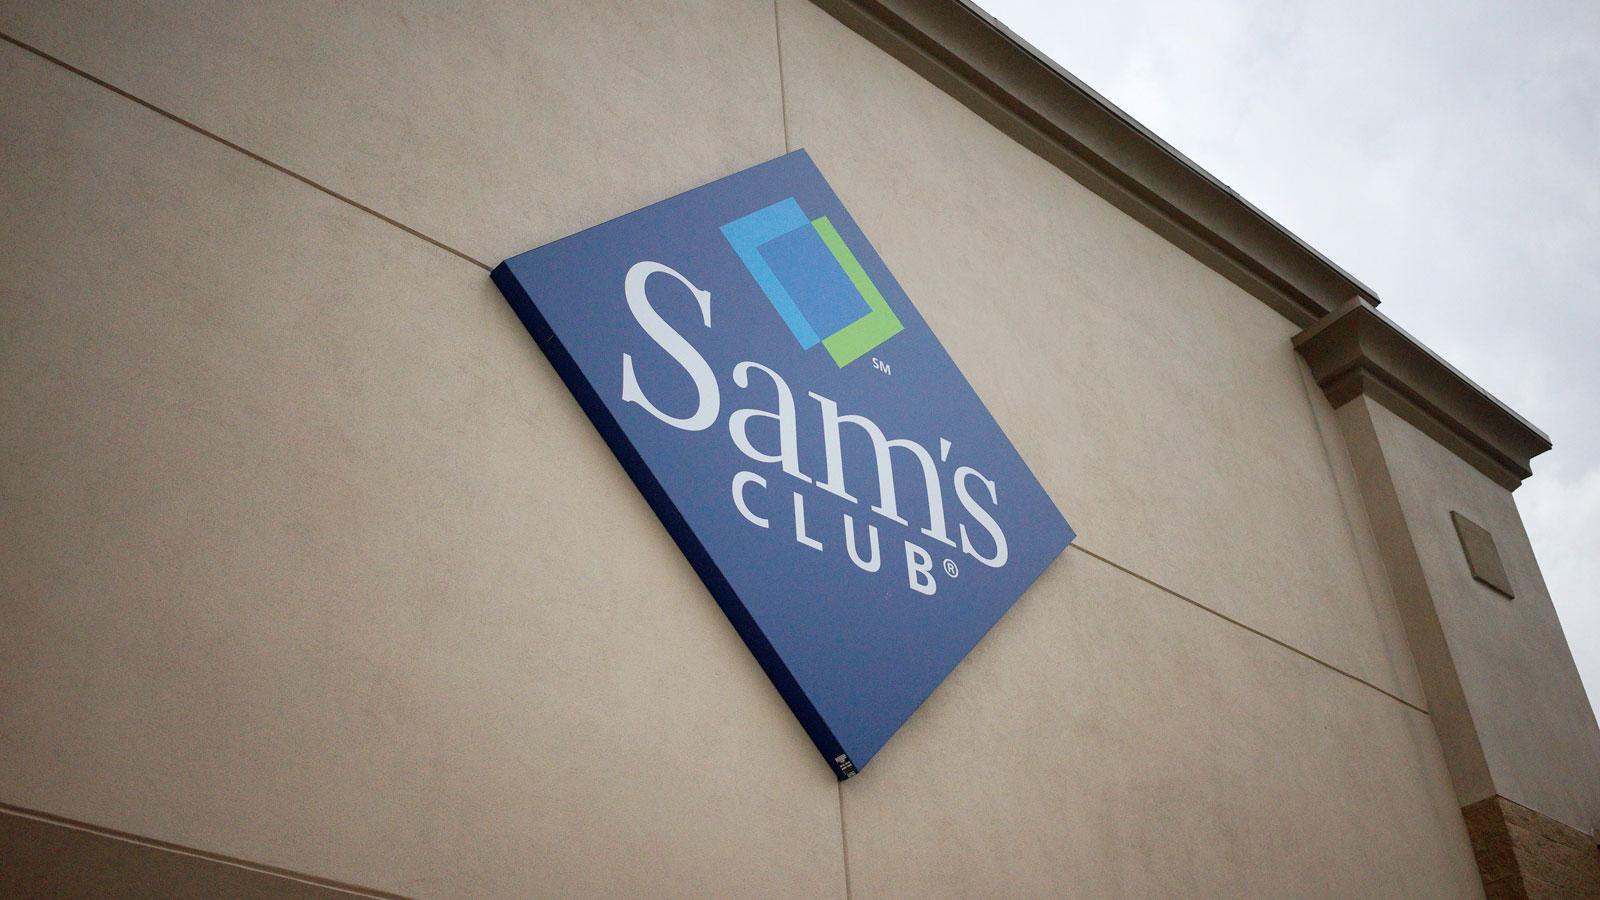 Sam's Club names new CEO